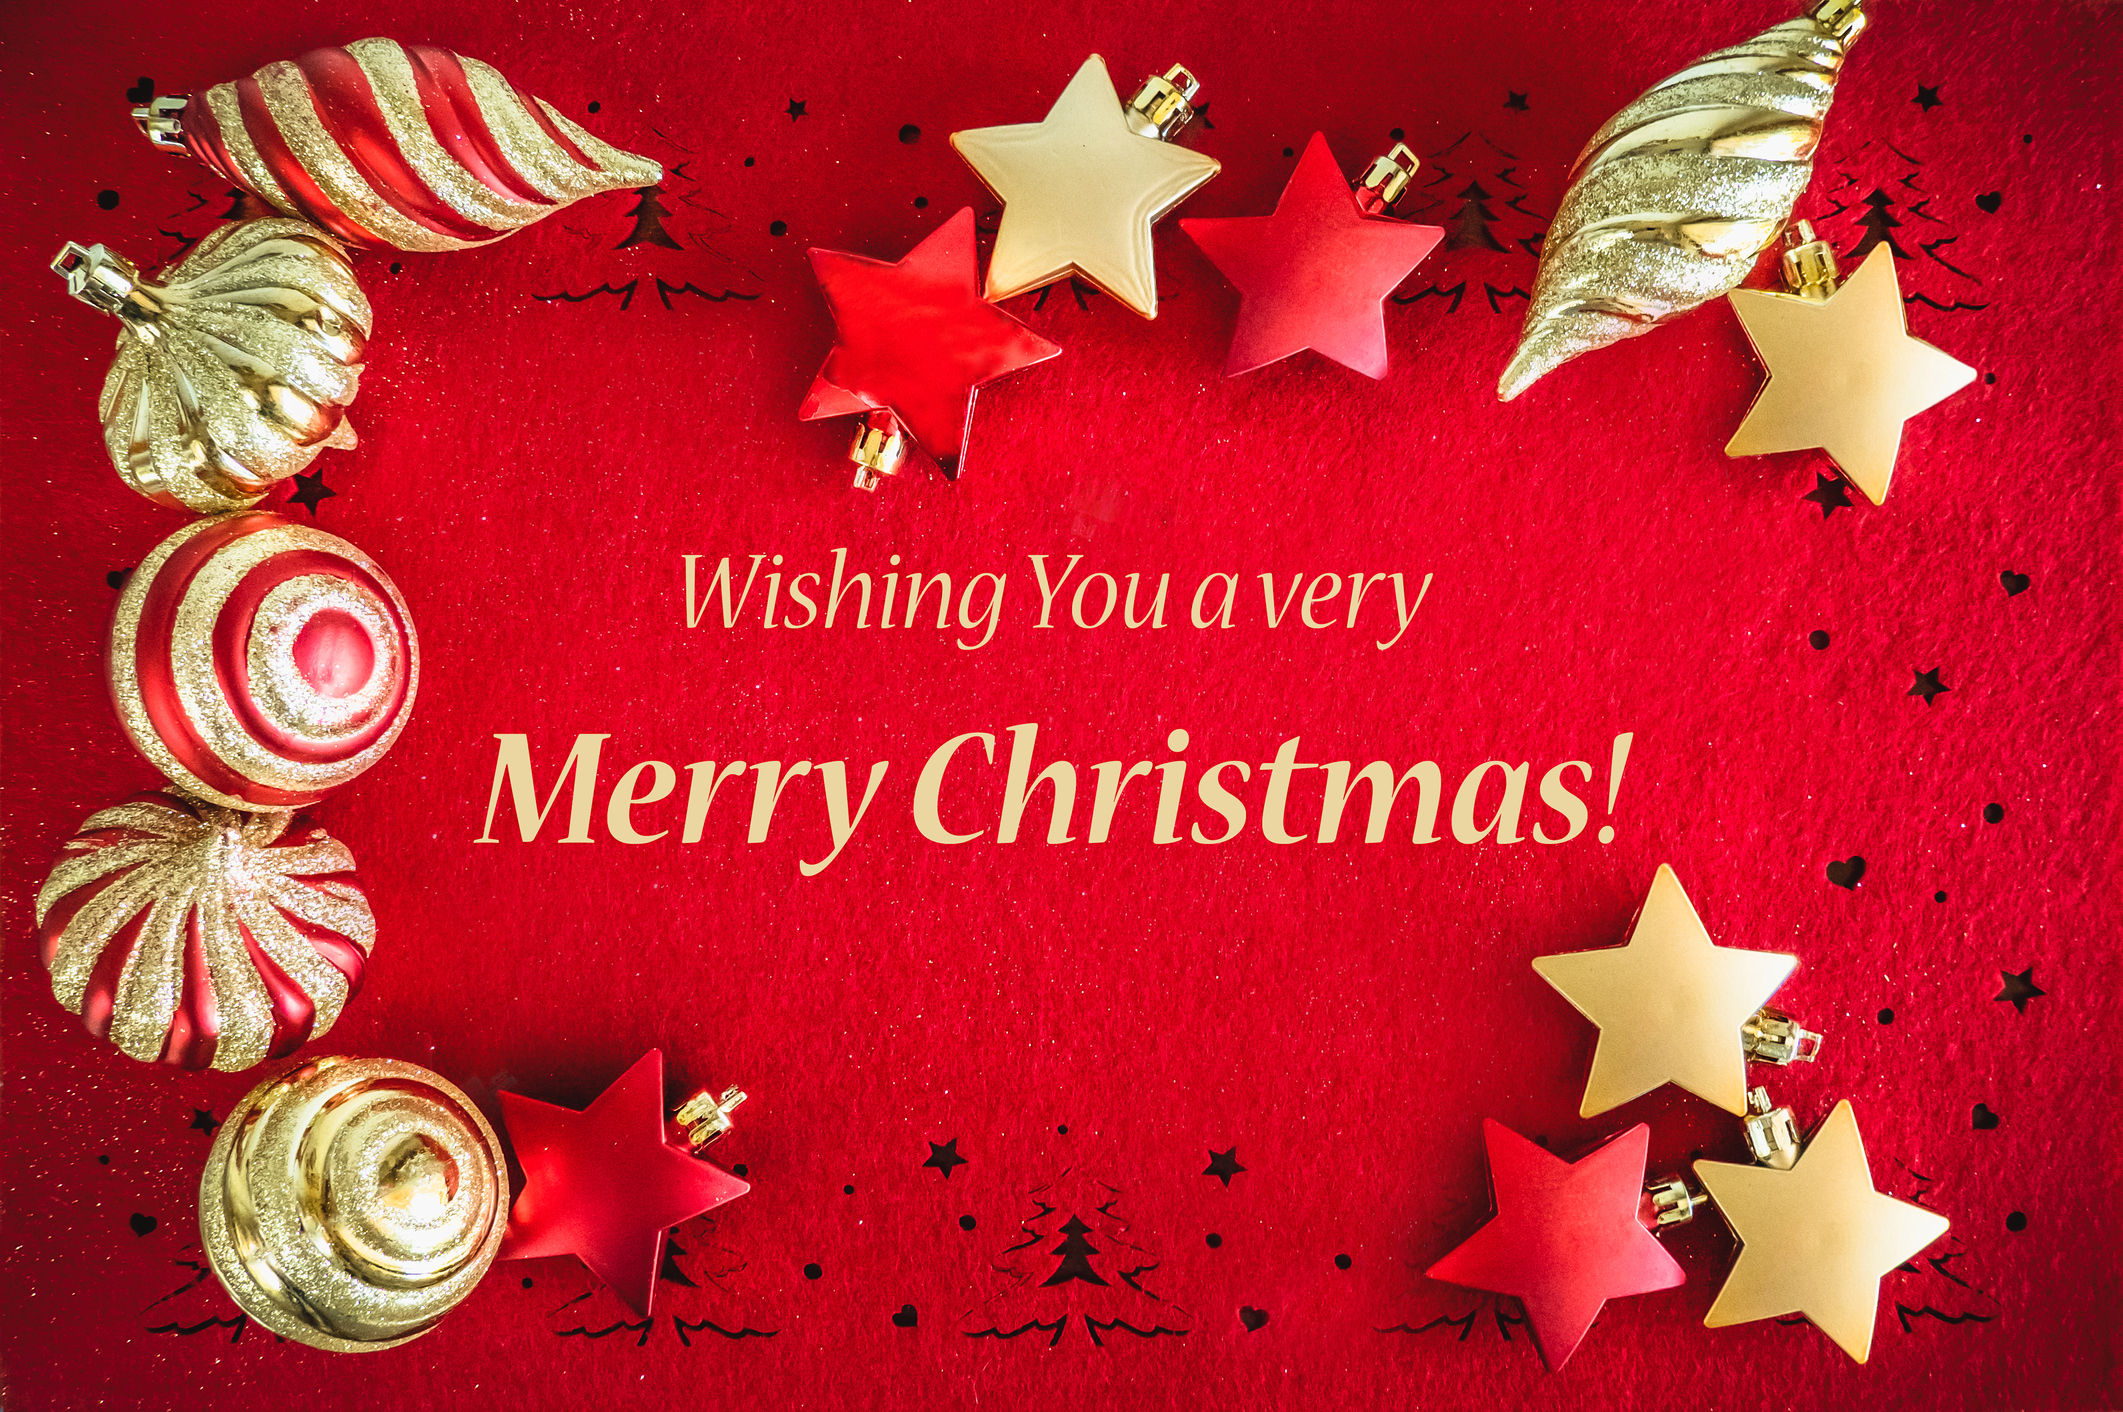 Merry Christmas - Christmas virtual jobs - Virtual Vocations